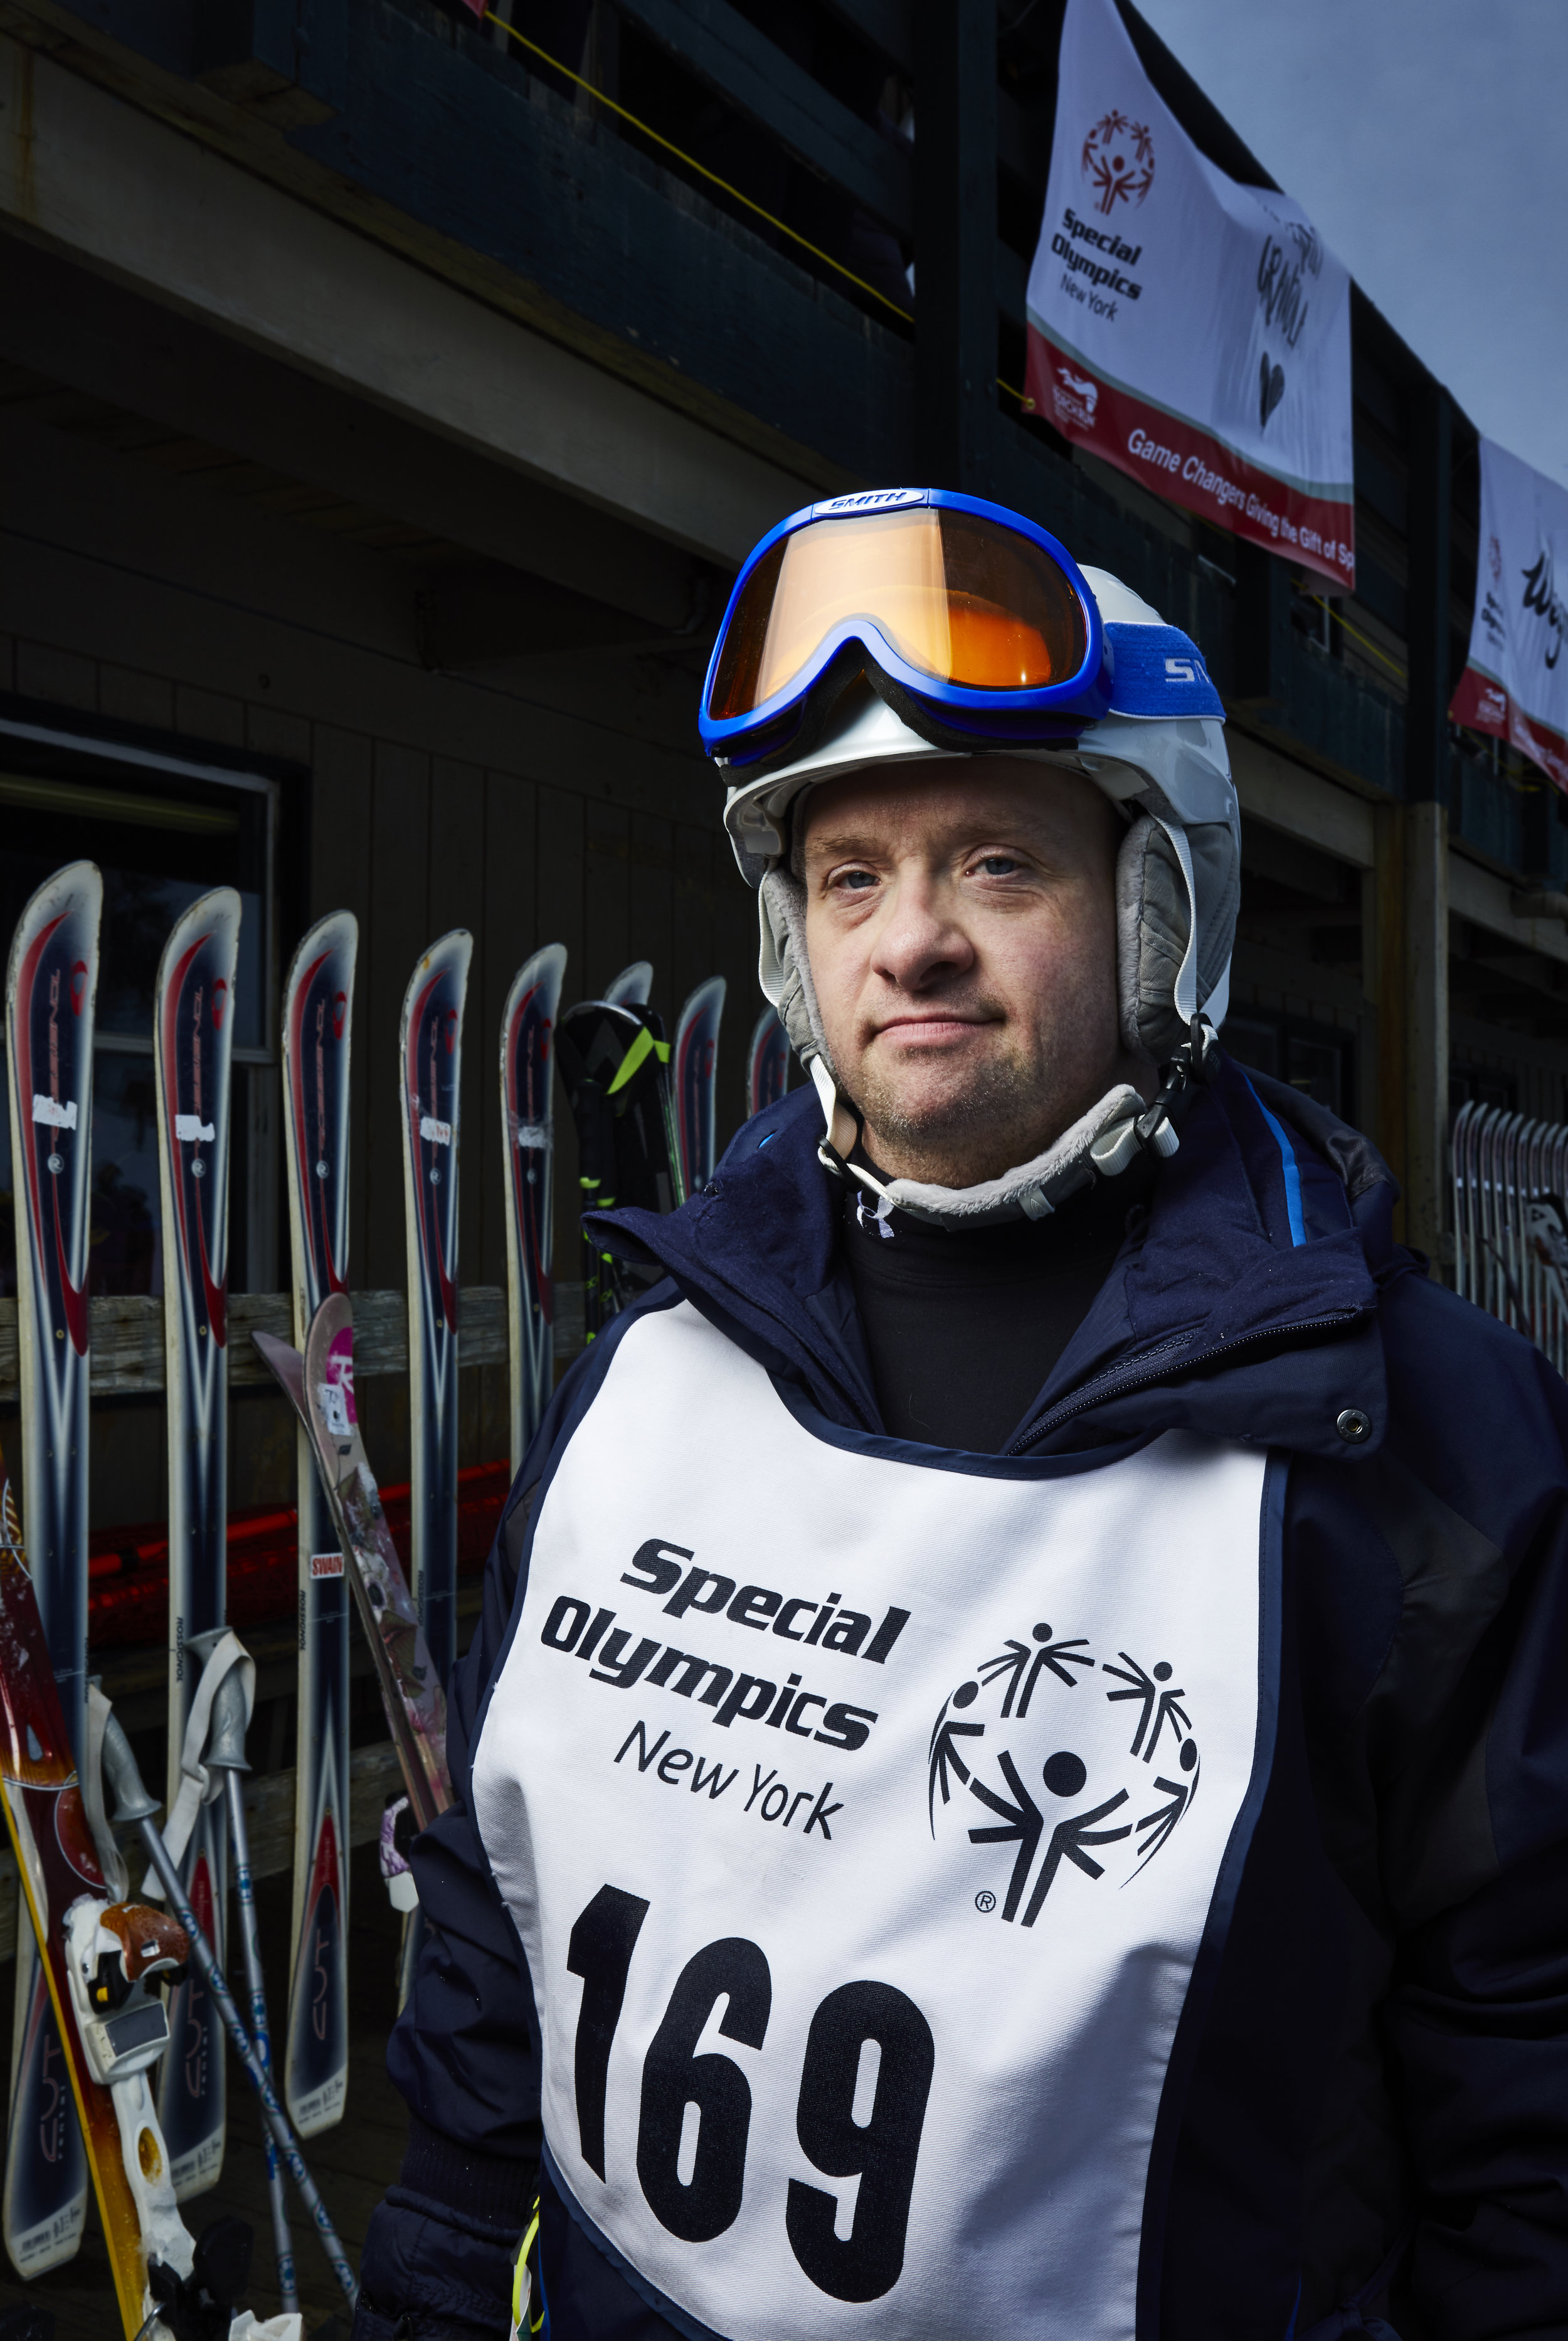 Daniel J. Voelxen  Onondaga Region  Alpine Skiing  (Photo by Anthony Avellano)